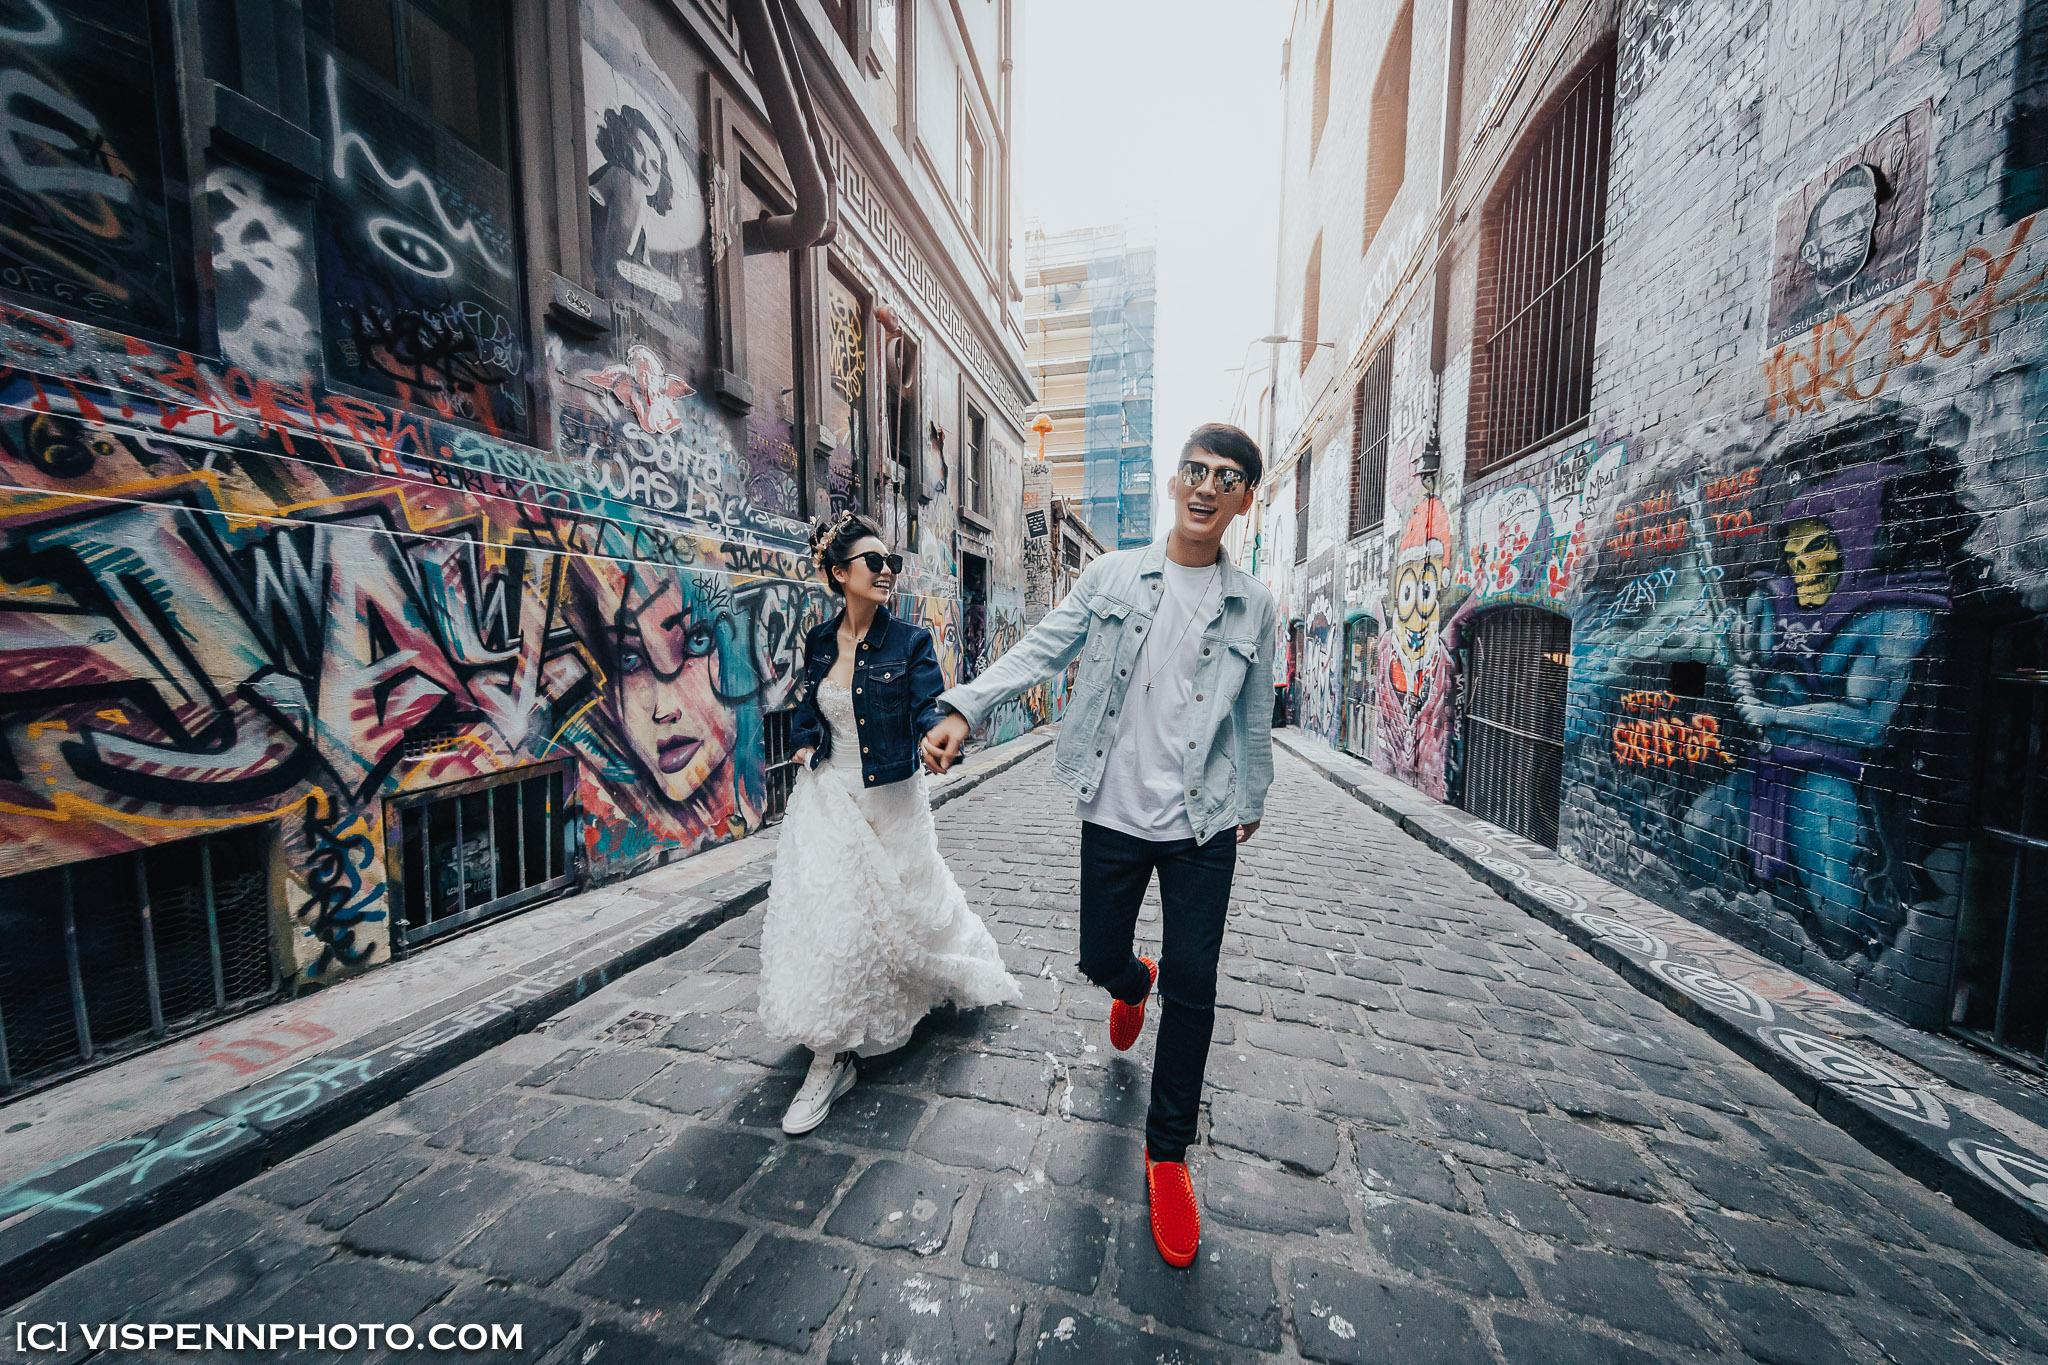 PRE WEDDING Photography Melbourne 5D4 2793